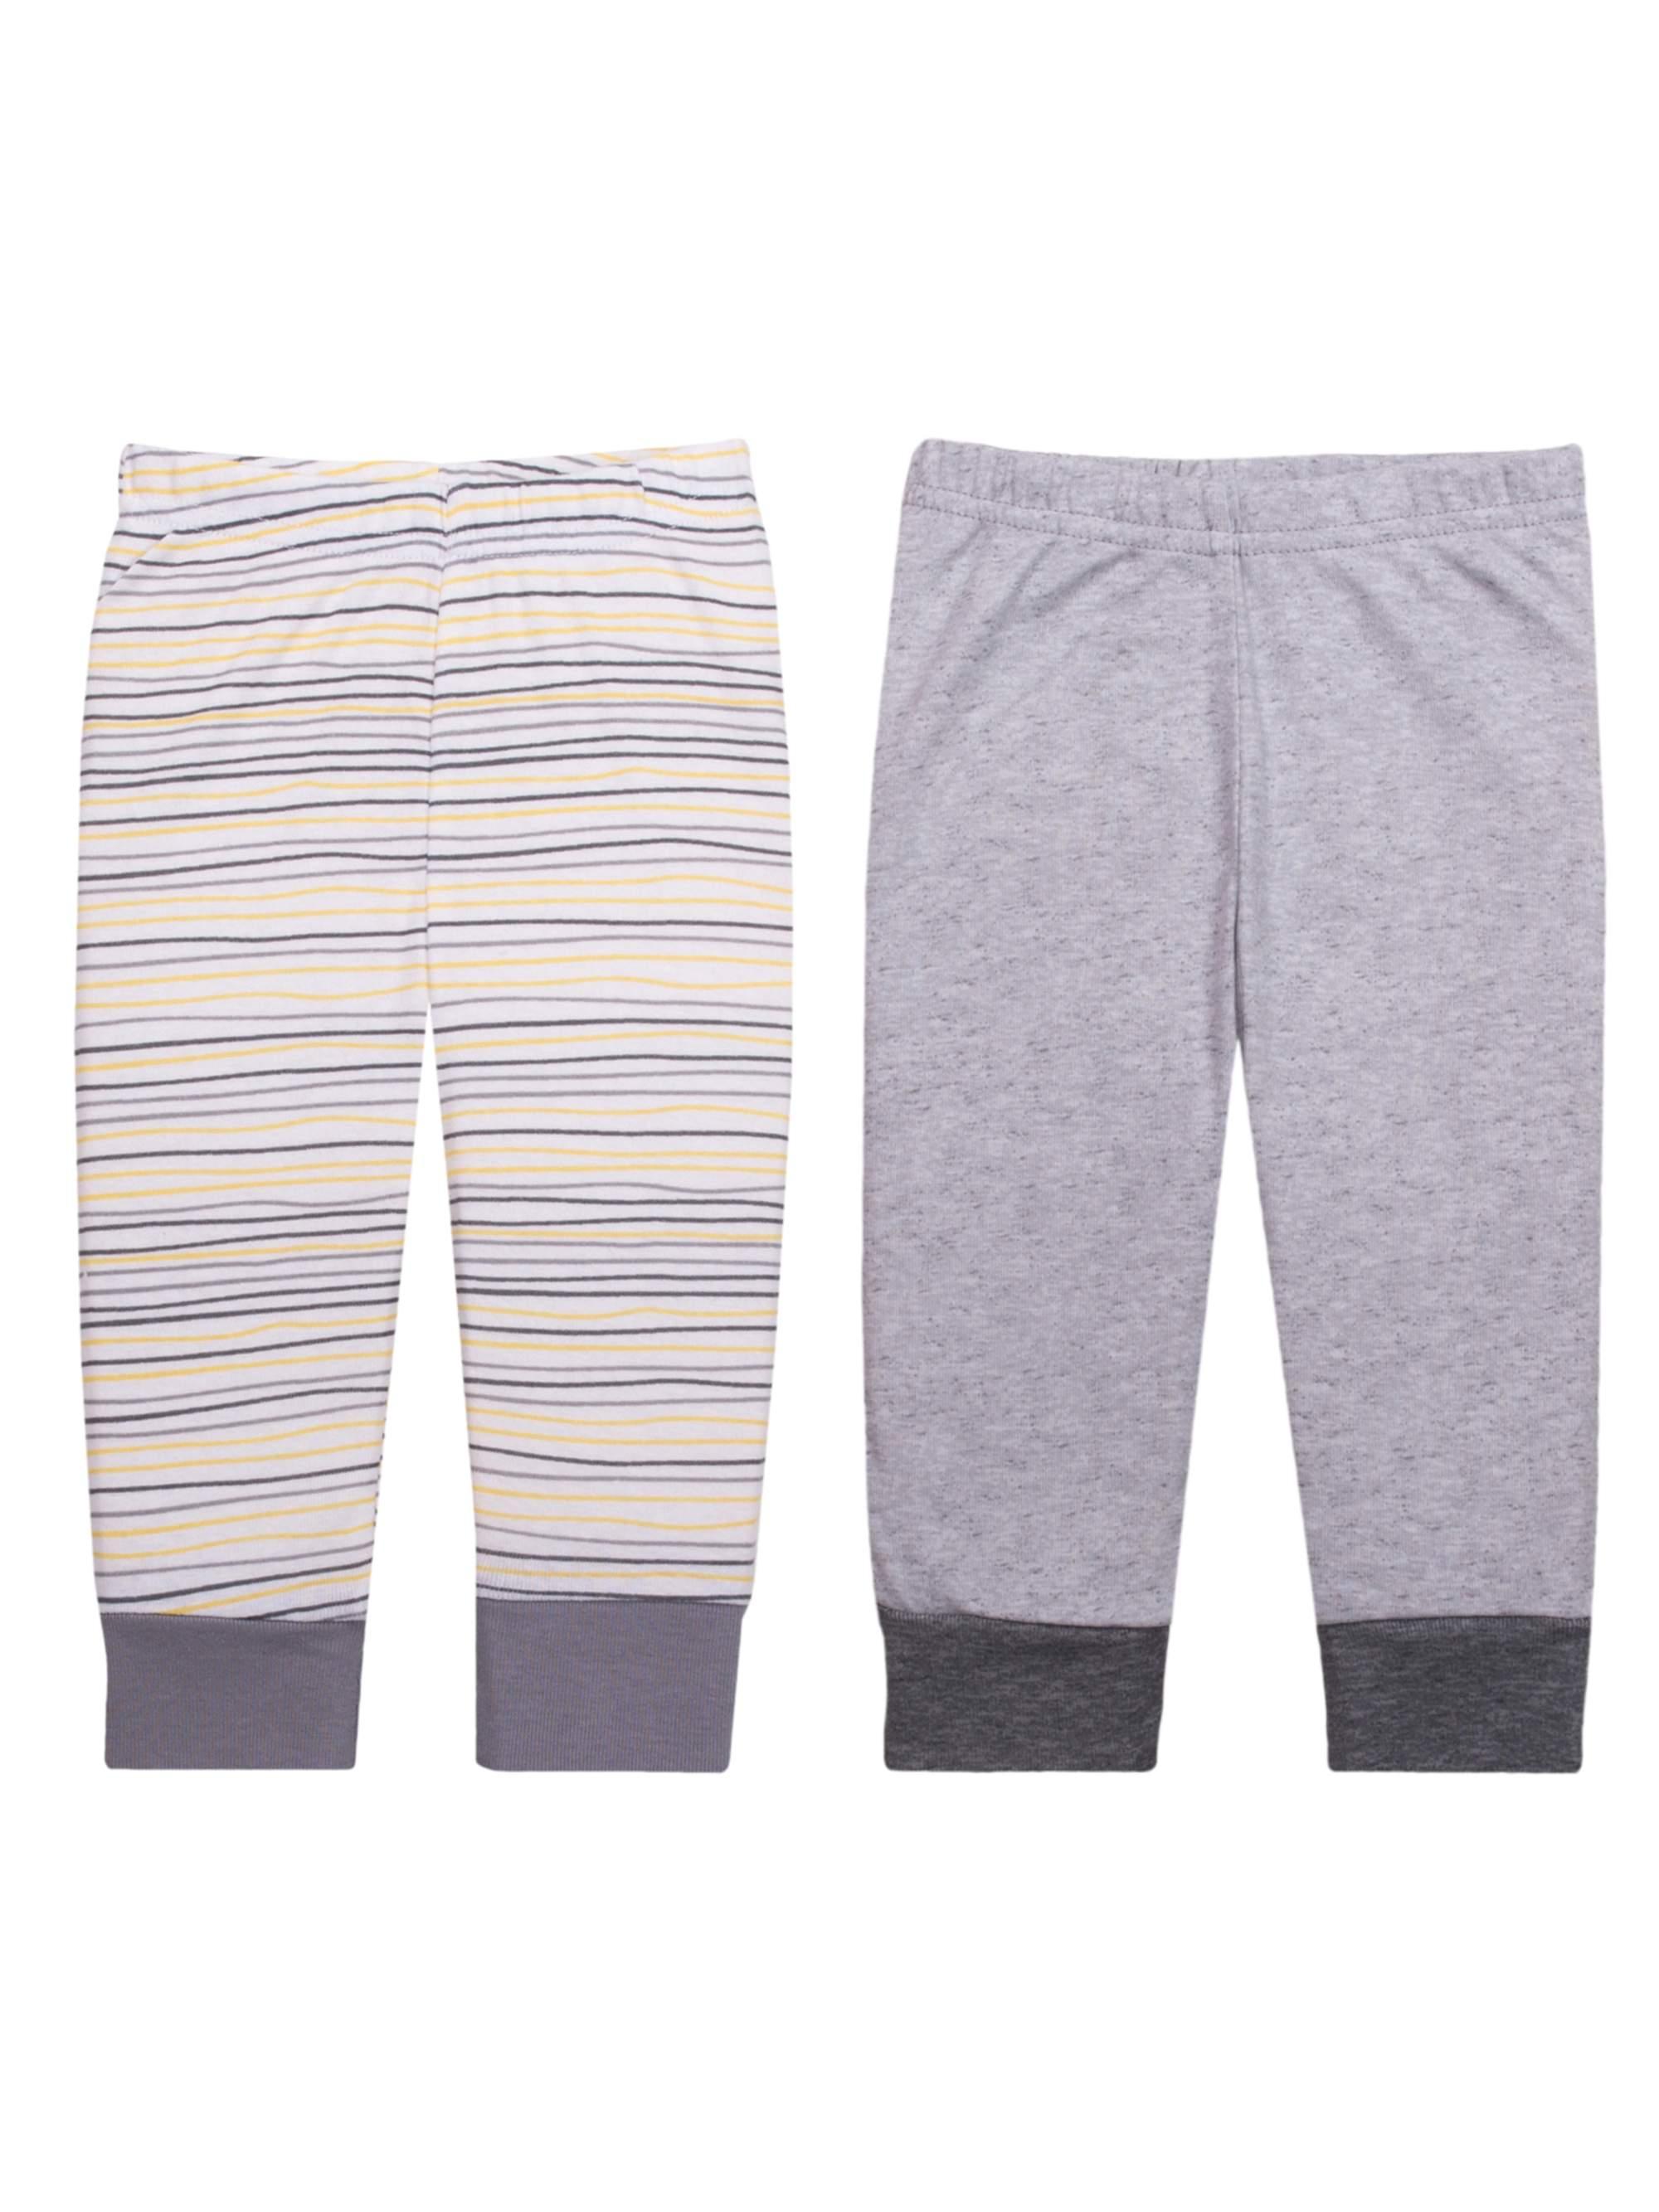 Newborn Baby Boy or Girl Unisex Knit Pants, 2-pack